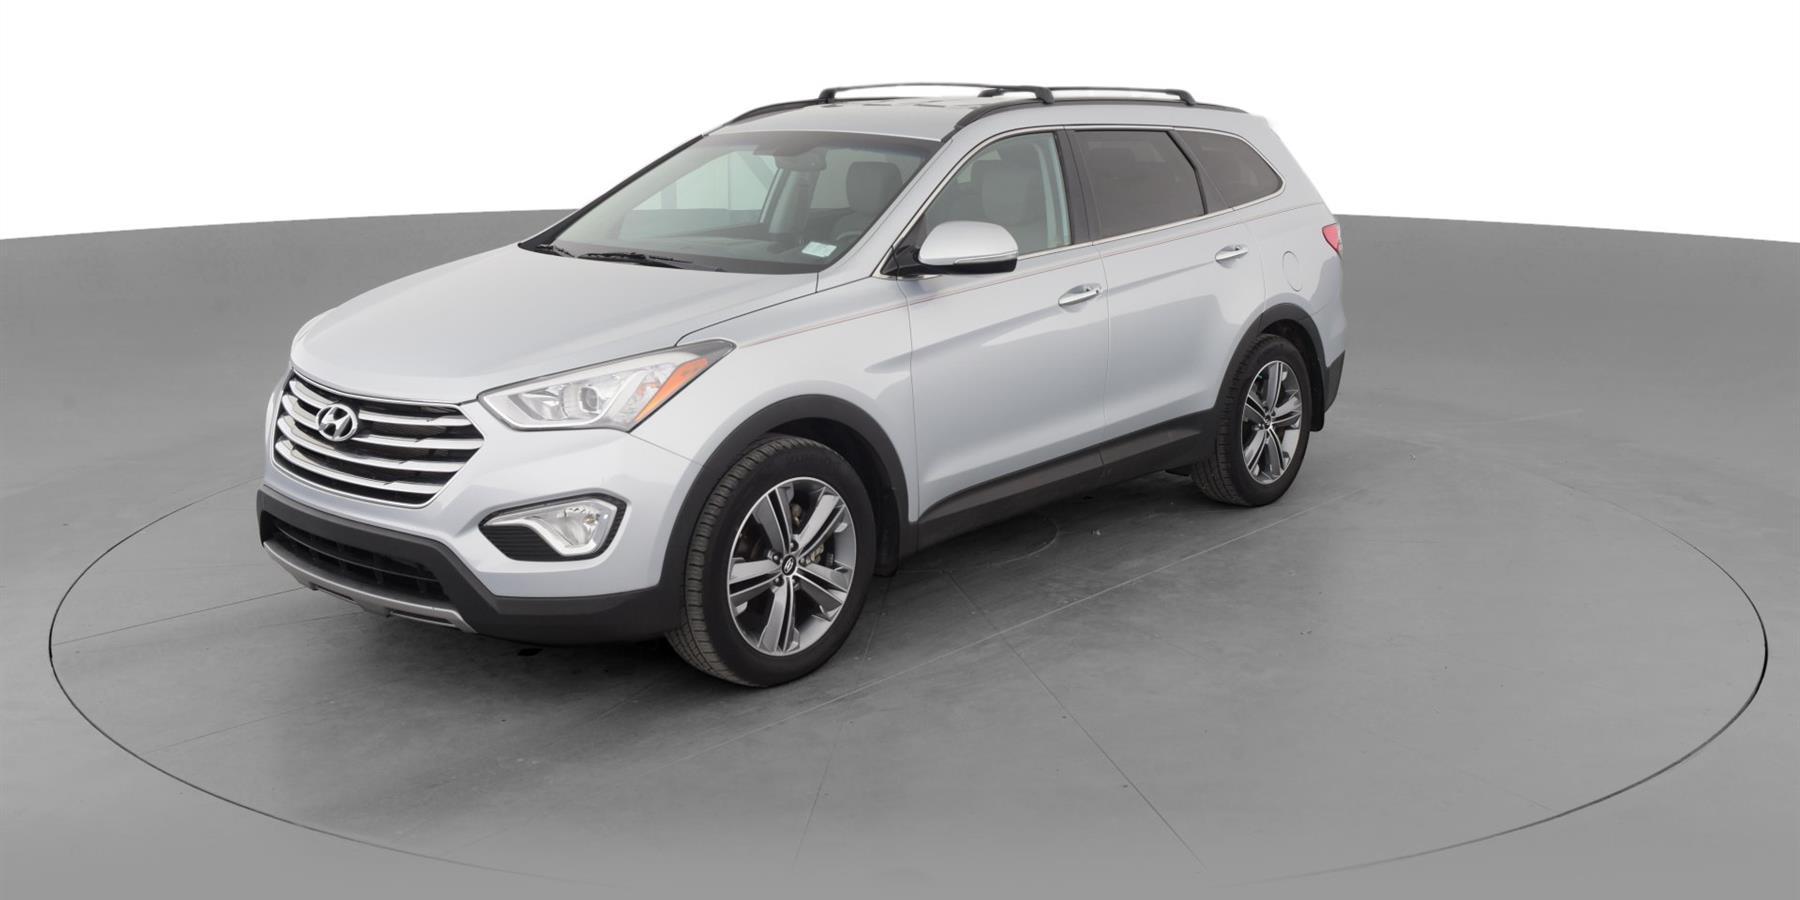 2015 Hyundai Santa Fe Limited Sport Utility 4d For Sale